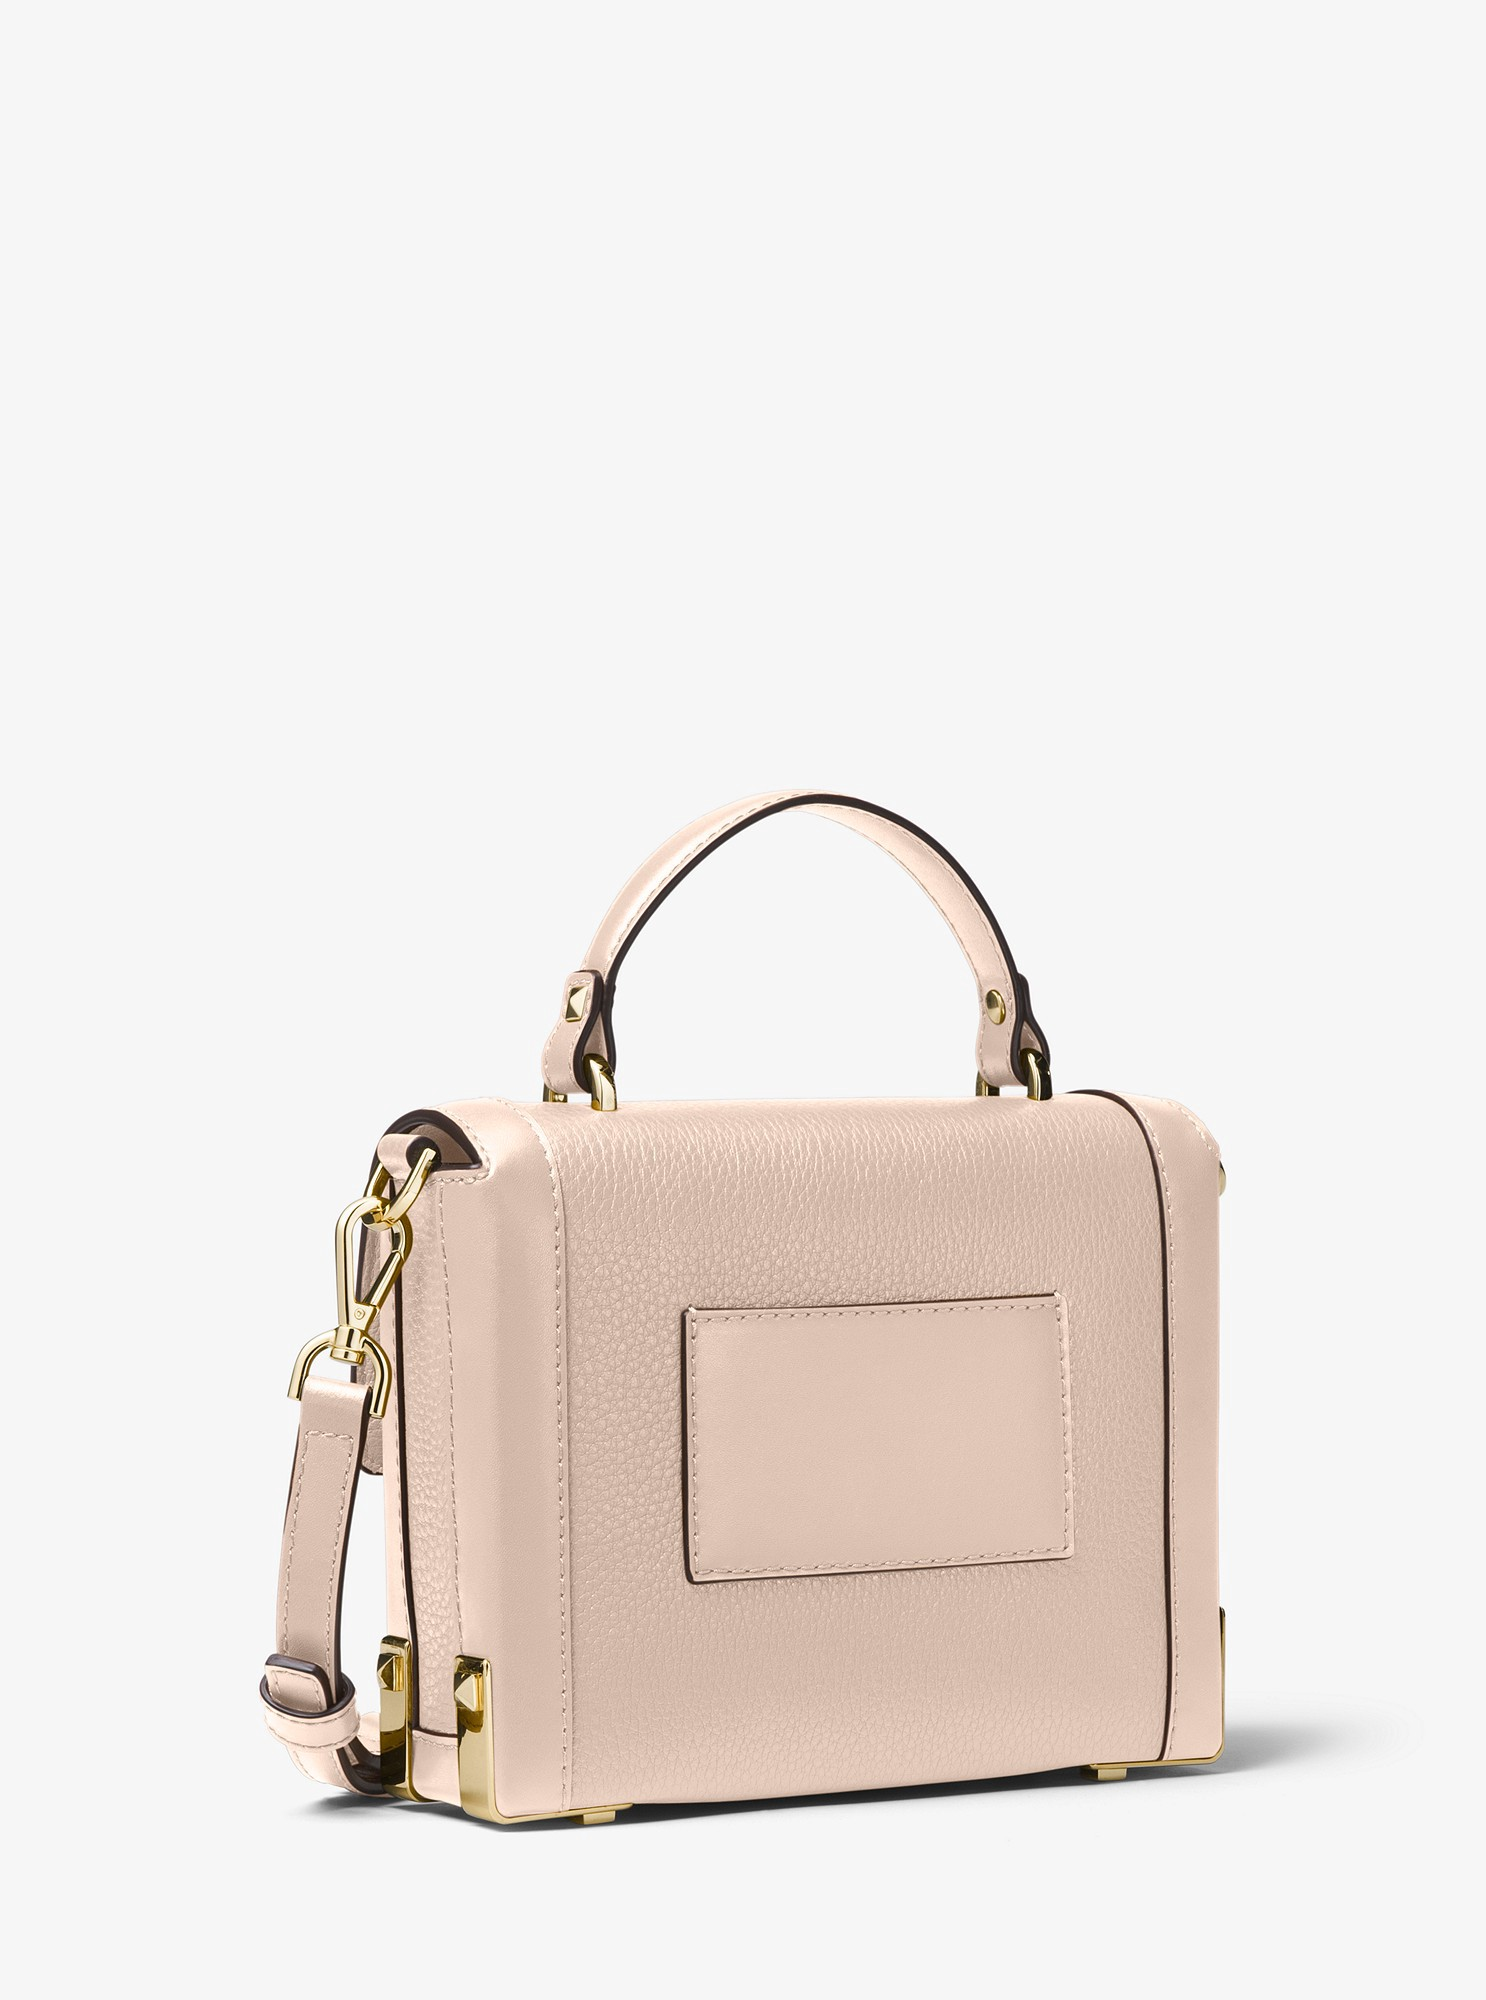 ff1fdc1ba94db Michael Kors Jayne Small Pebbled Leather Trunk Bag - Soft Pink